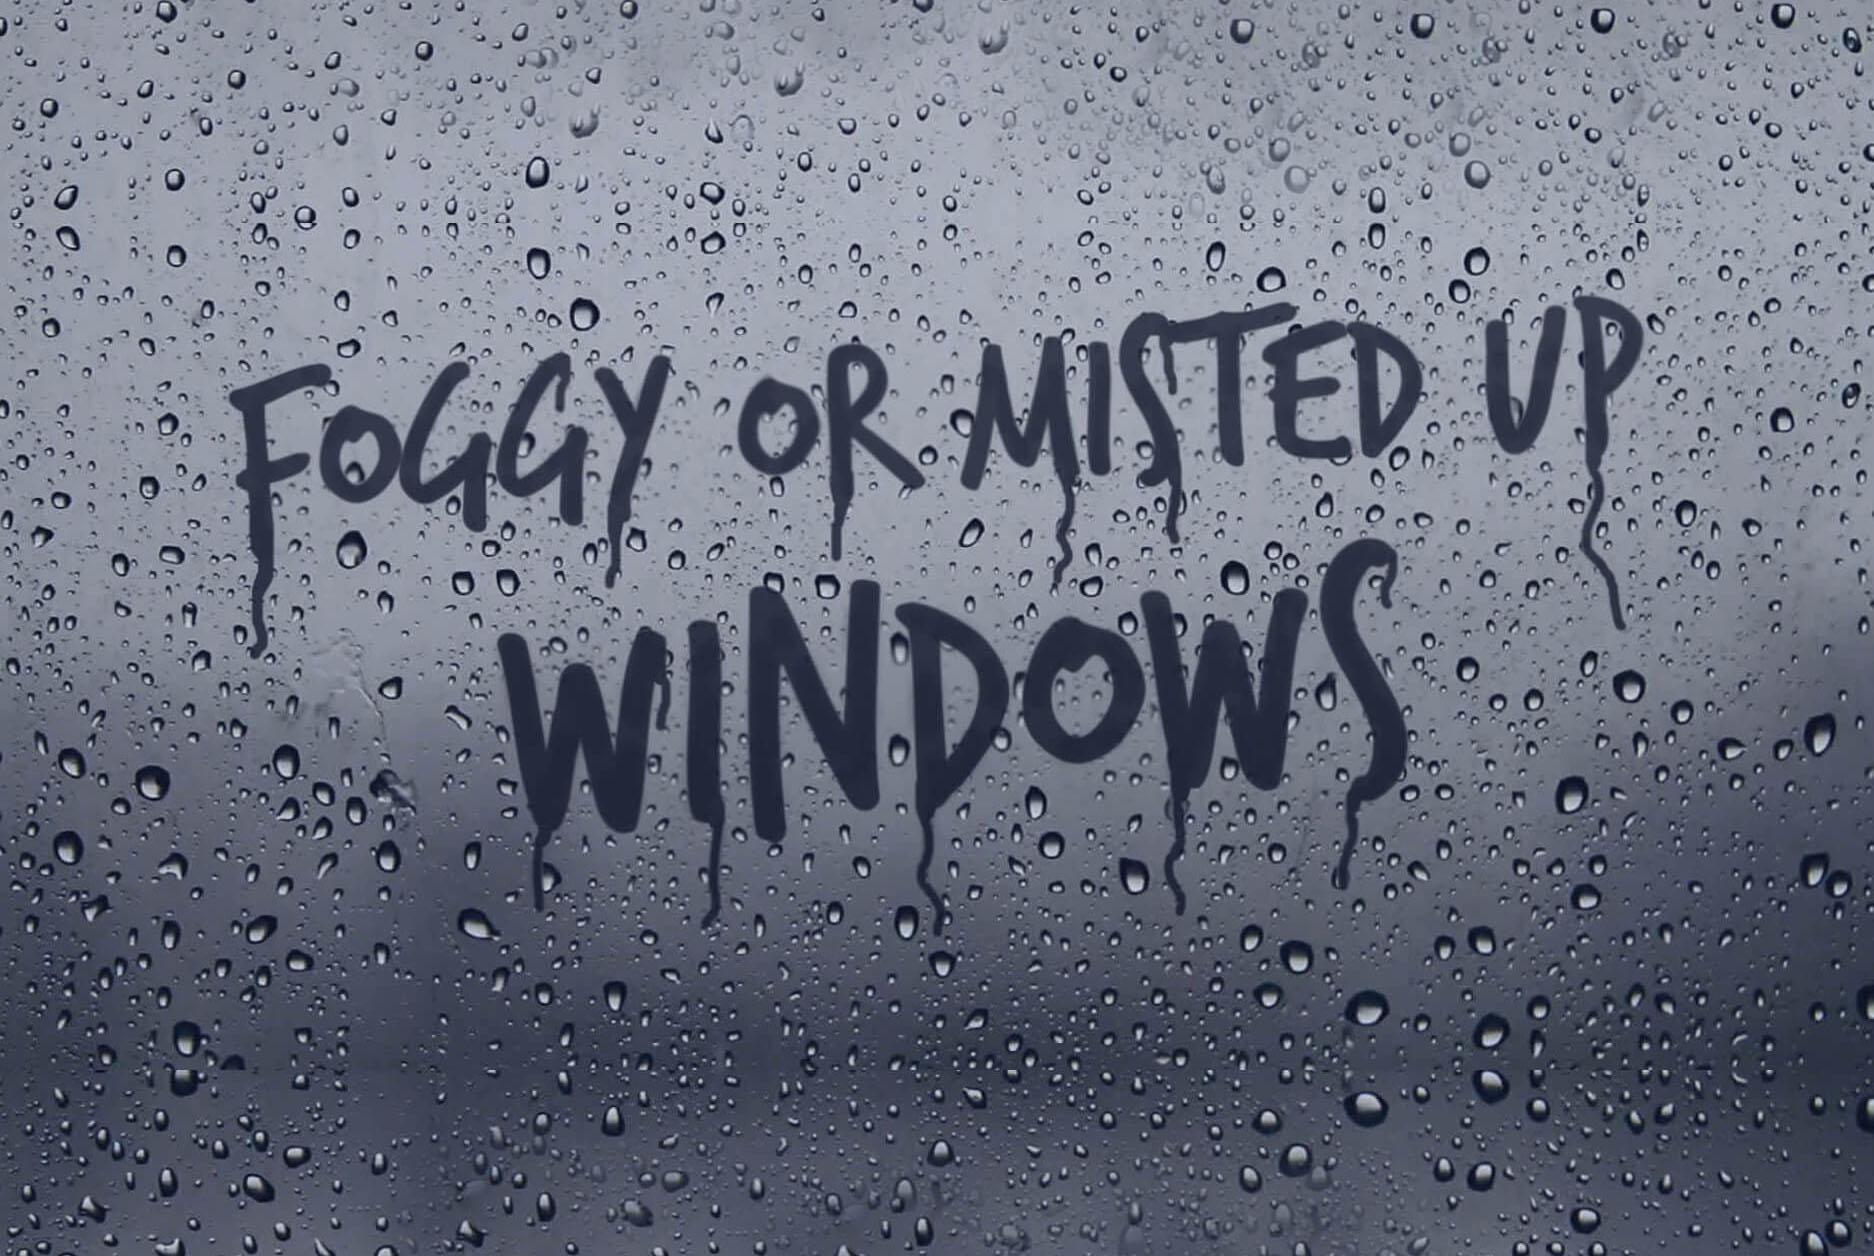 Foggy or misted up windows